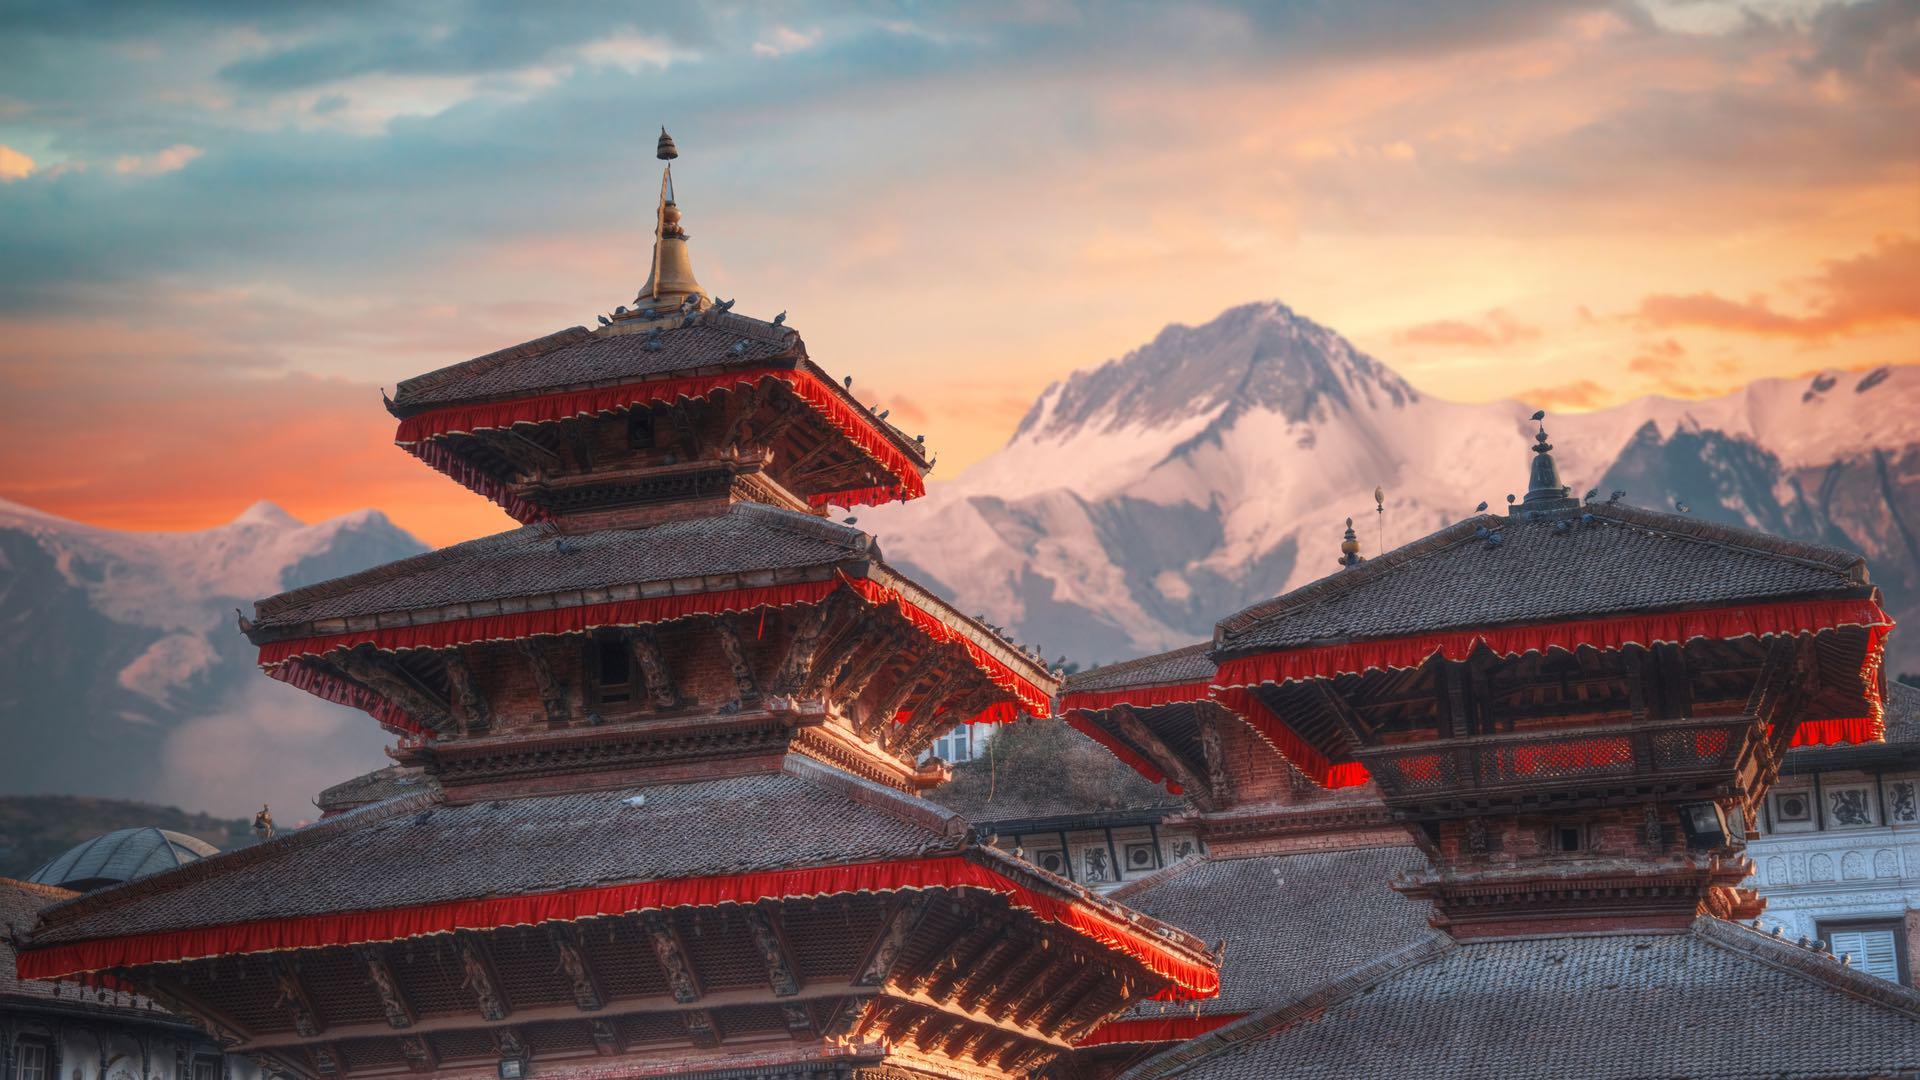 Nepal | Südasien | ©Skreidzeleu/Shutterstock.com